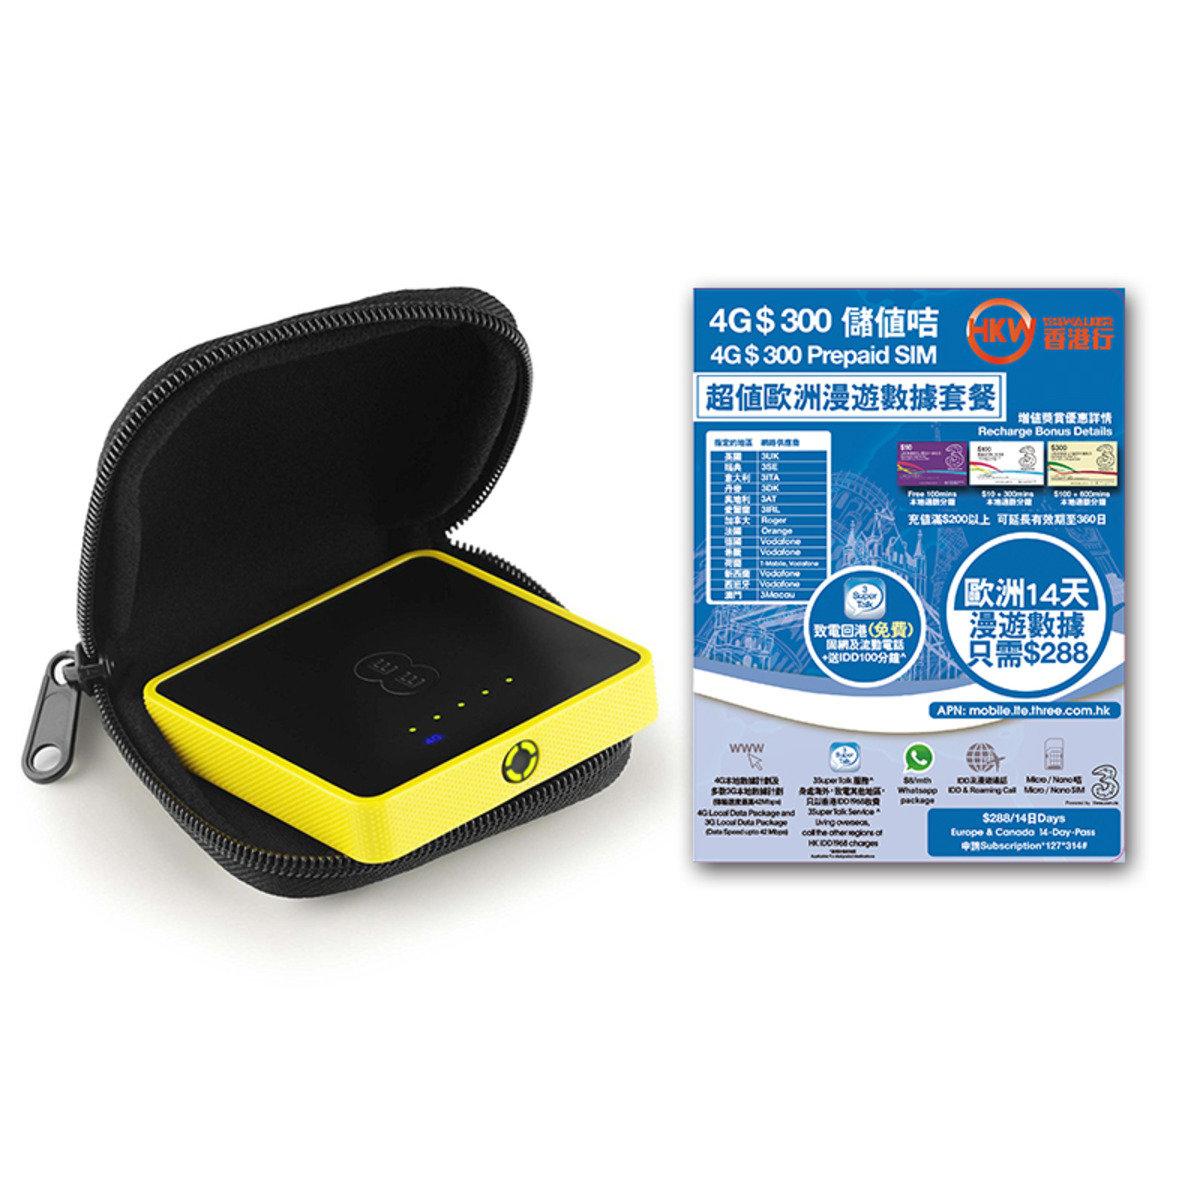 HKWALKER Osprey 2 Mini Wifi蛋 + 14天5GB prepaid sim歐洲漫遊數據咭 (expiry date:31-12-2017)